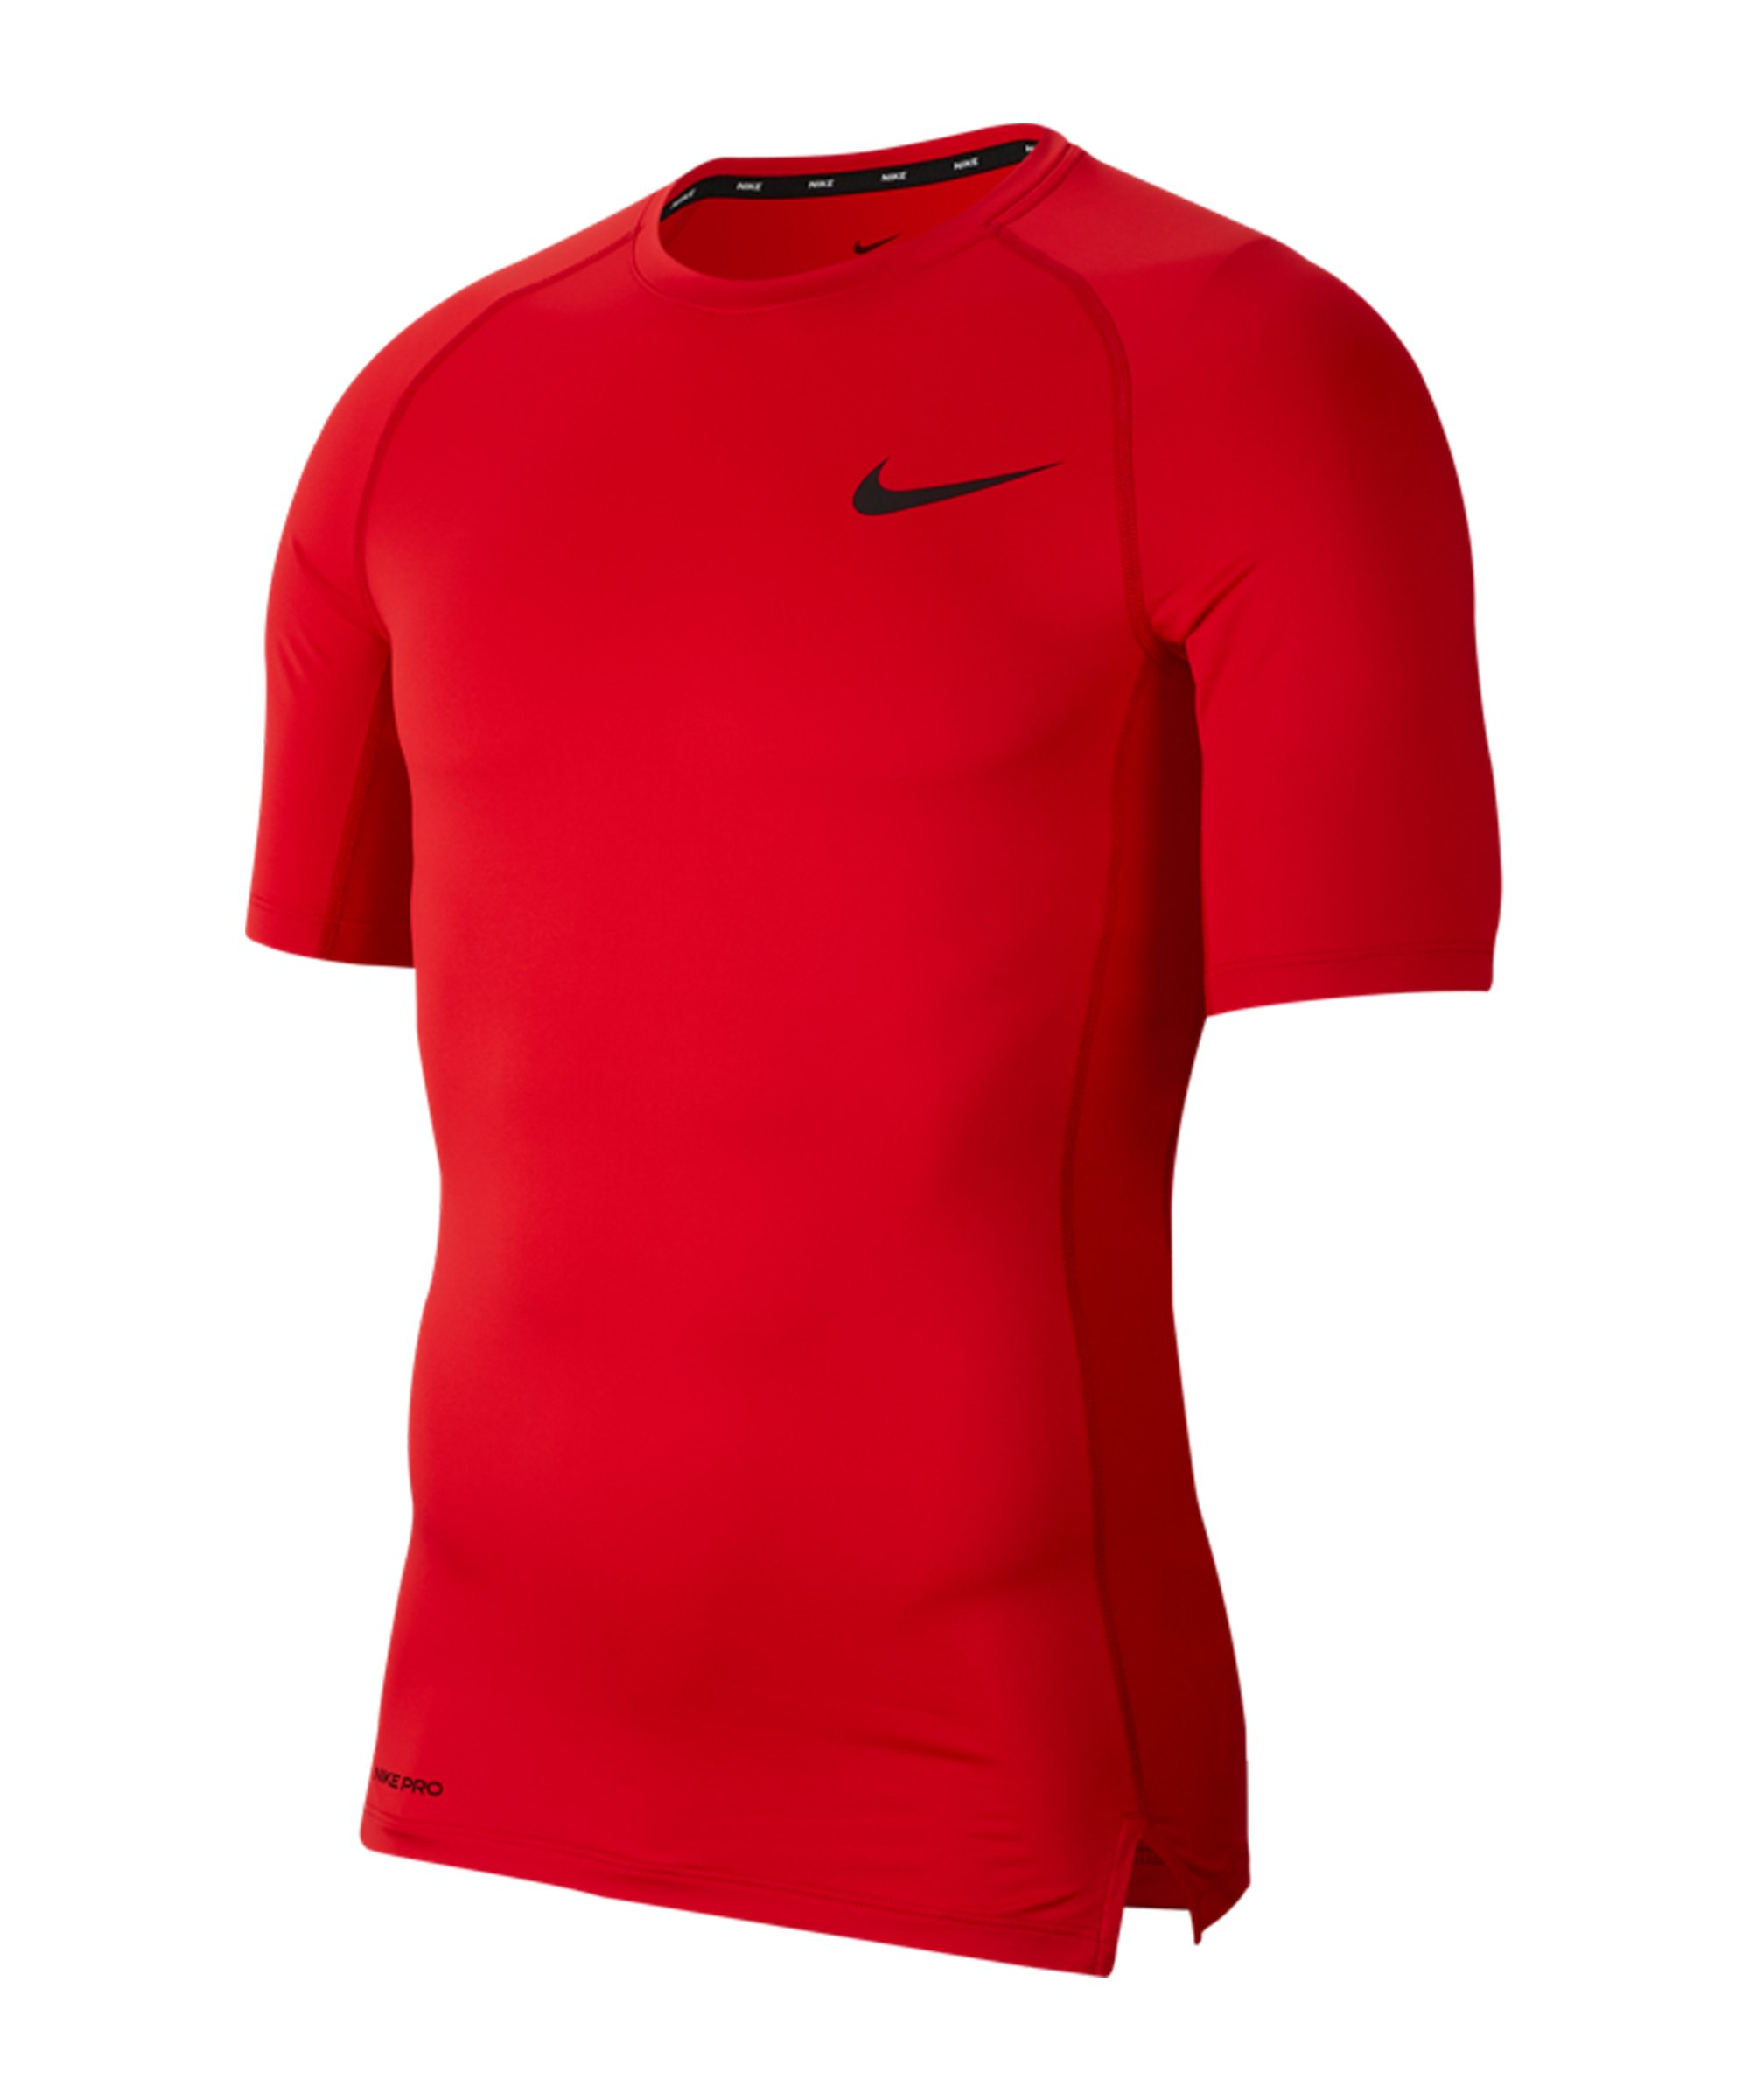 Nike Pro T-Shirt kurzarm Rot F657 - rot